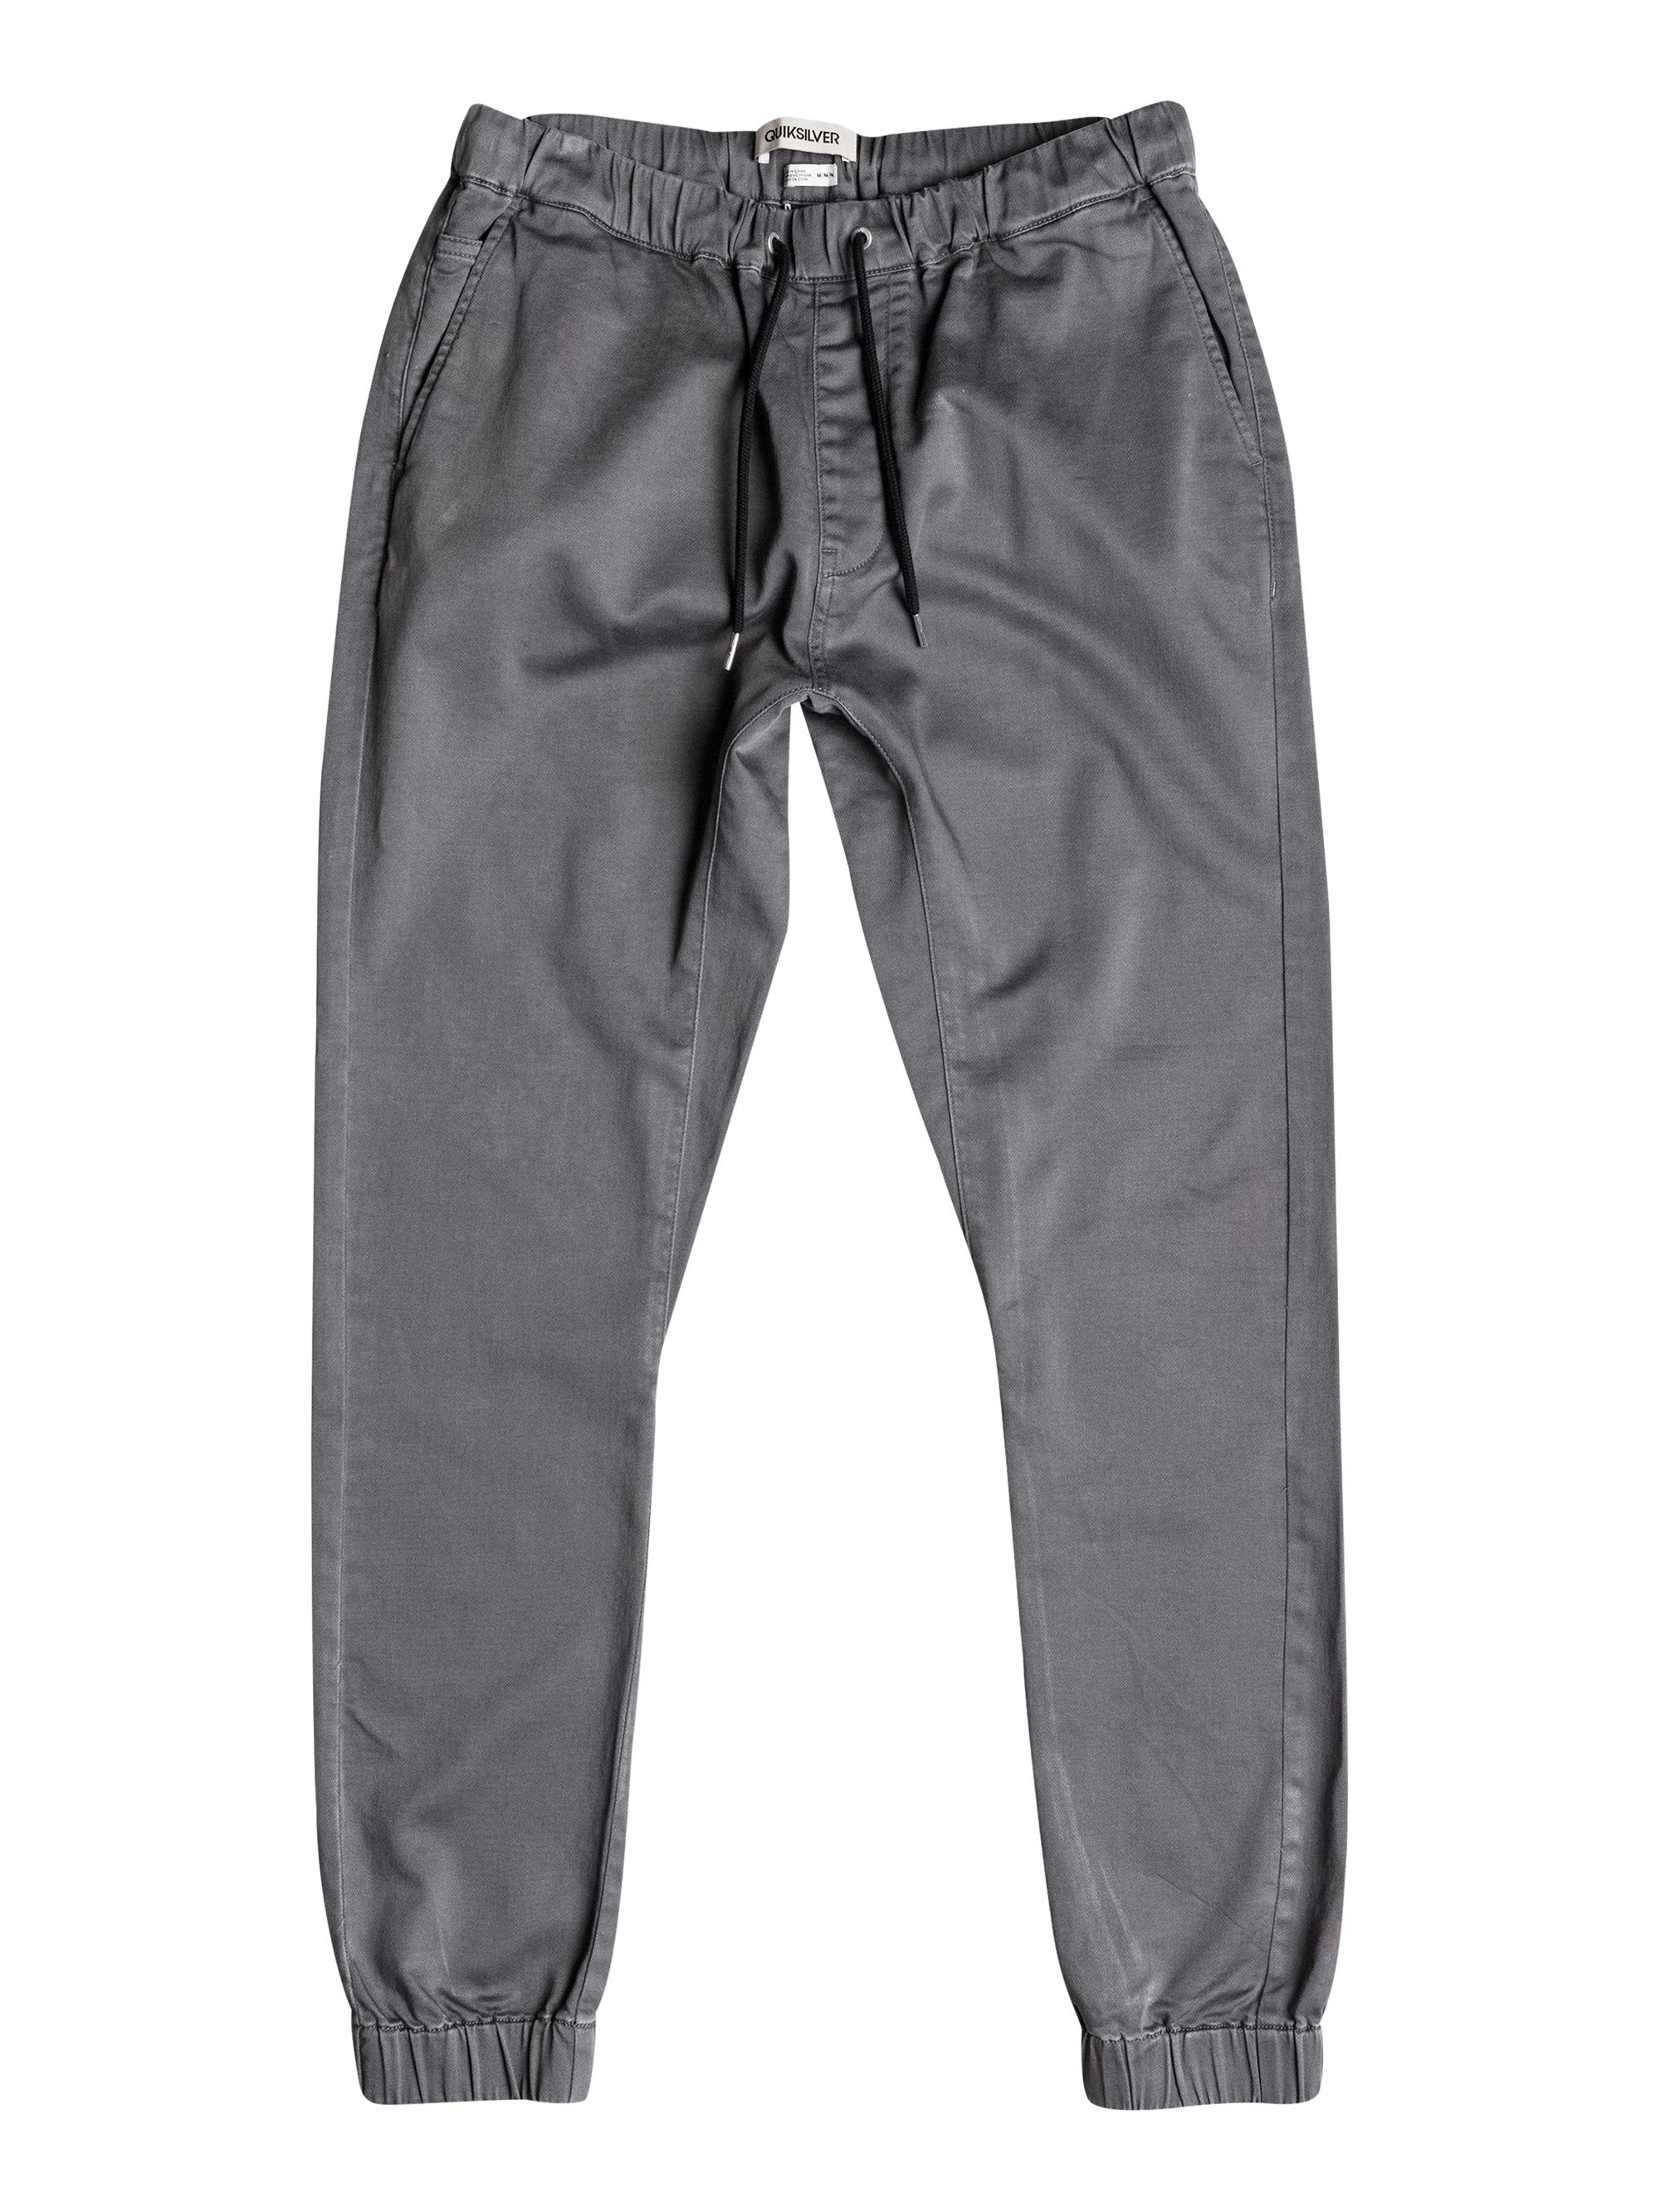 Spodnie Quiksilver Fonic Ndpt (Dark Shadow) Ss16